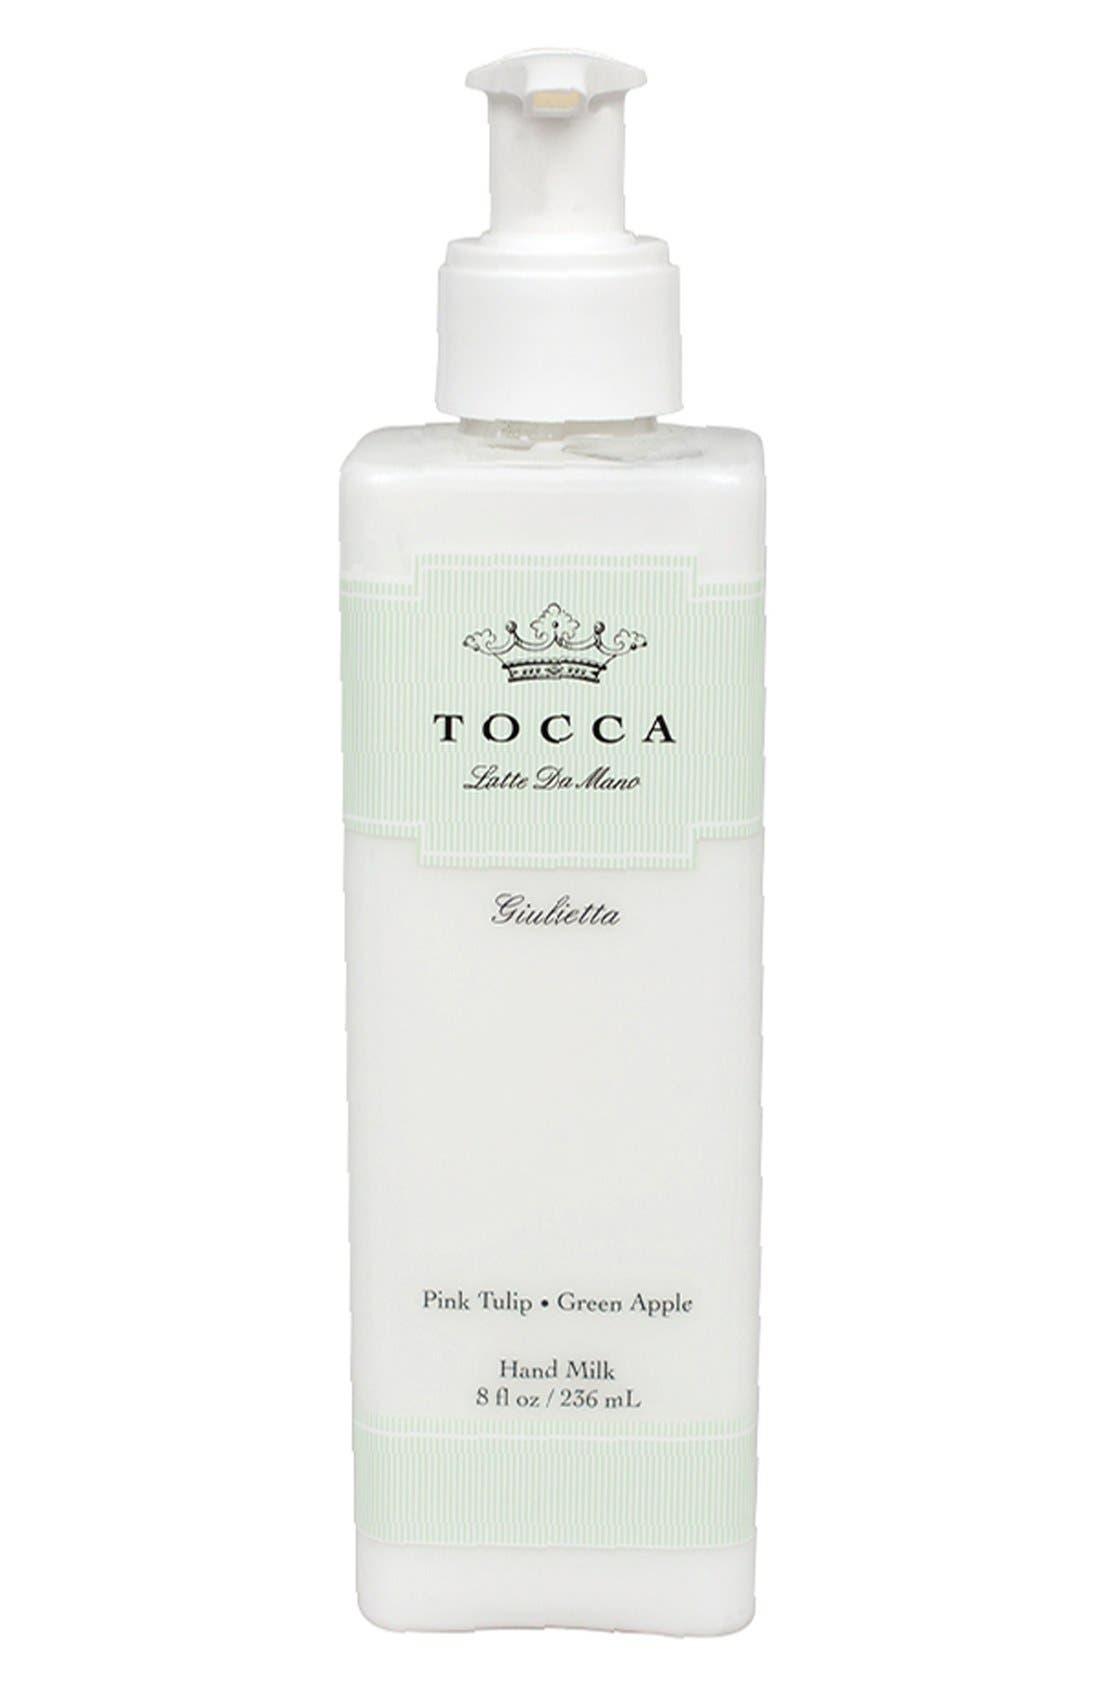 TOCCA 'Giulietta Latte da Mano' Hand Milk